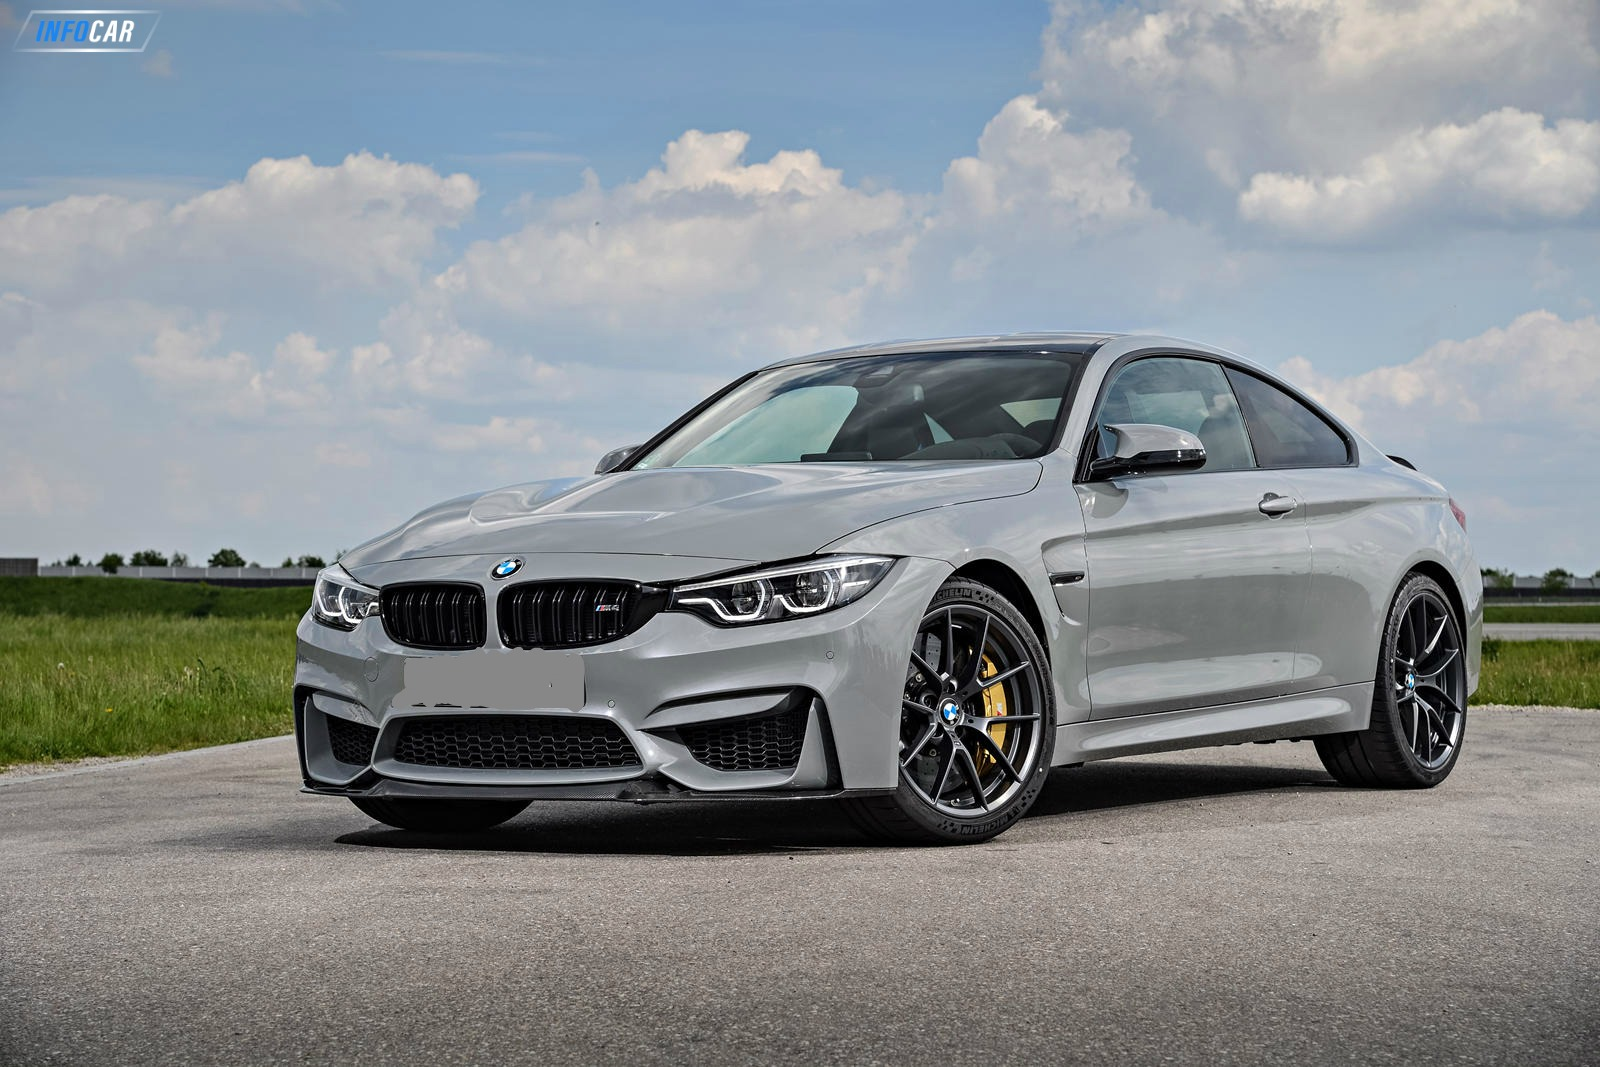 2019 BMW M4 m4cs - INFOCAR - Toronto's Most Comprehensive New and Used Auto Trading Platform